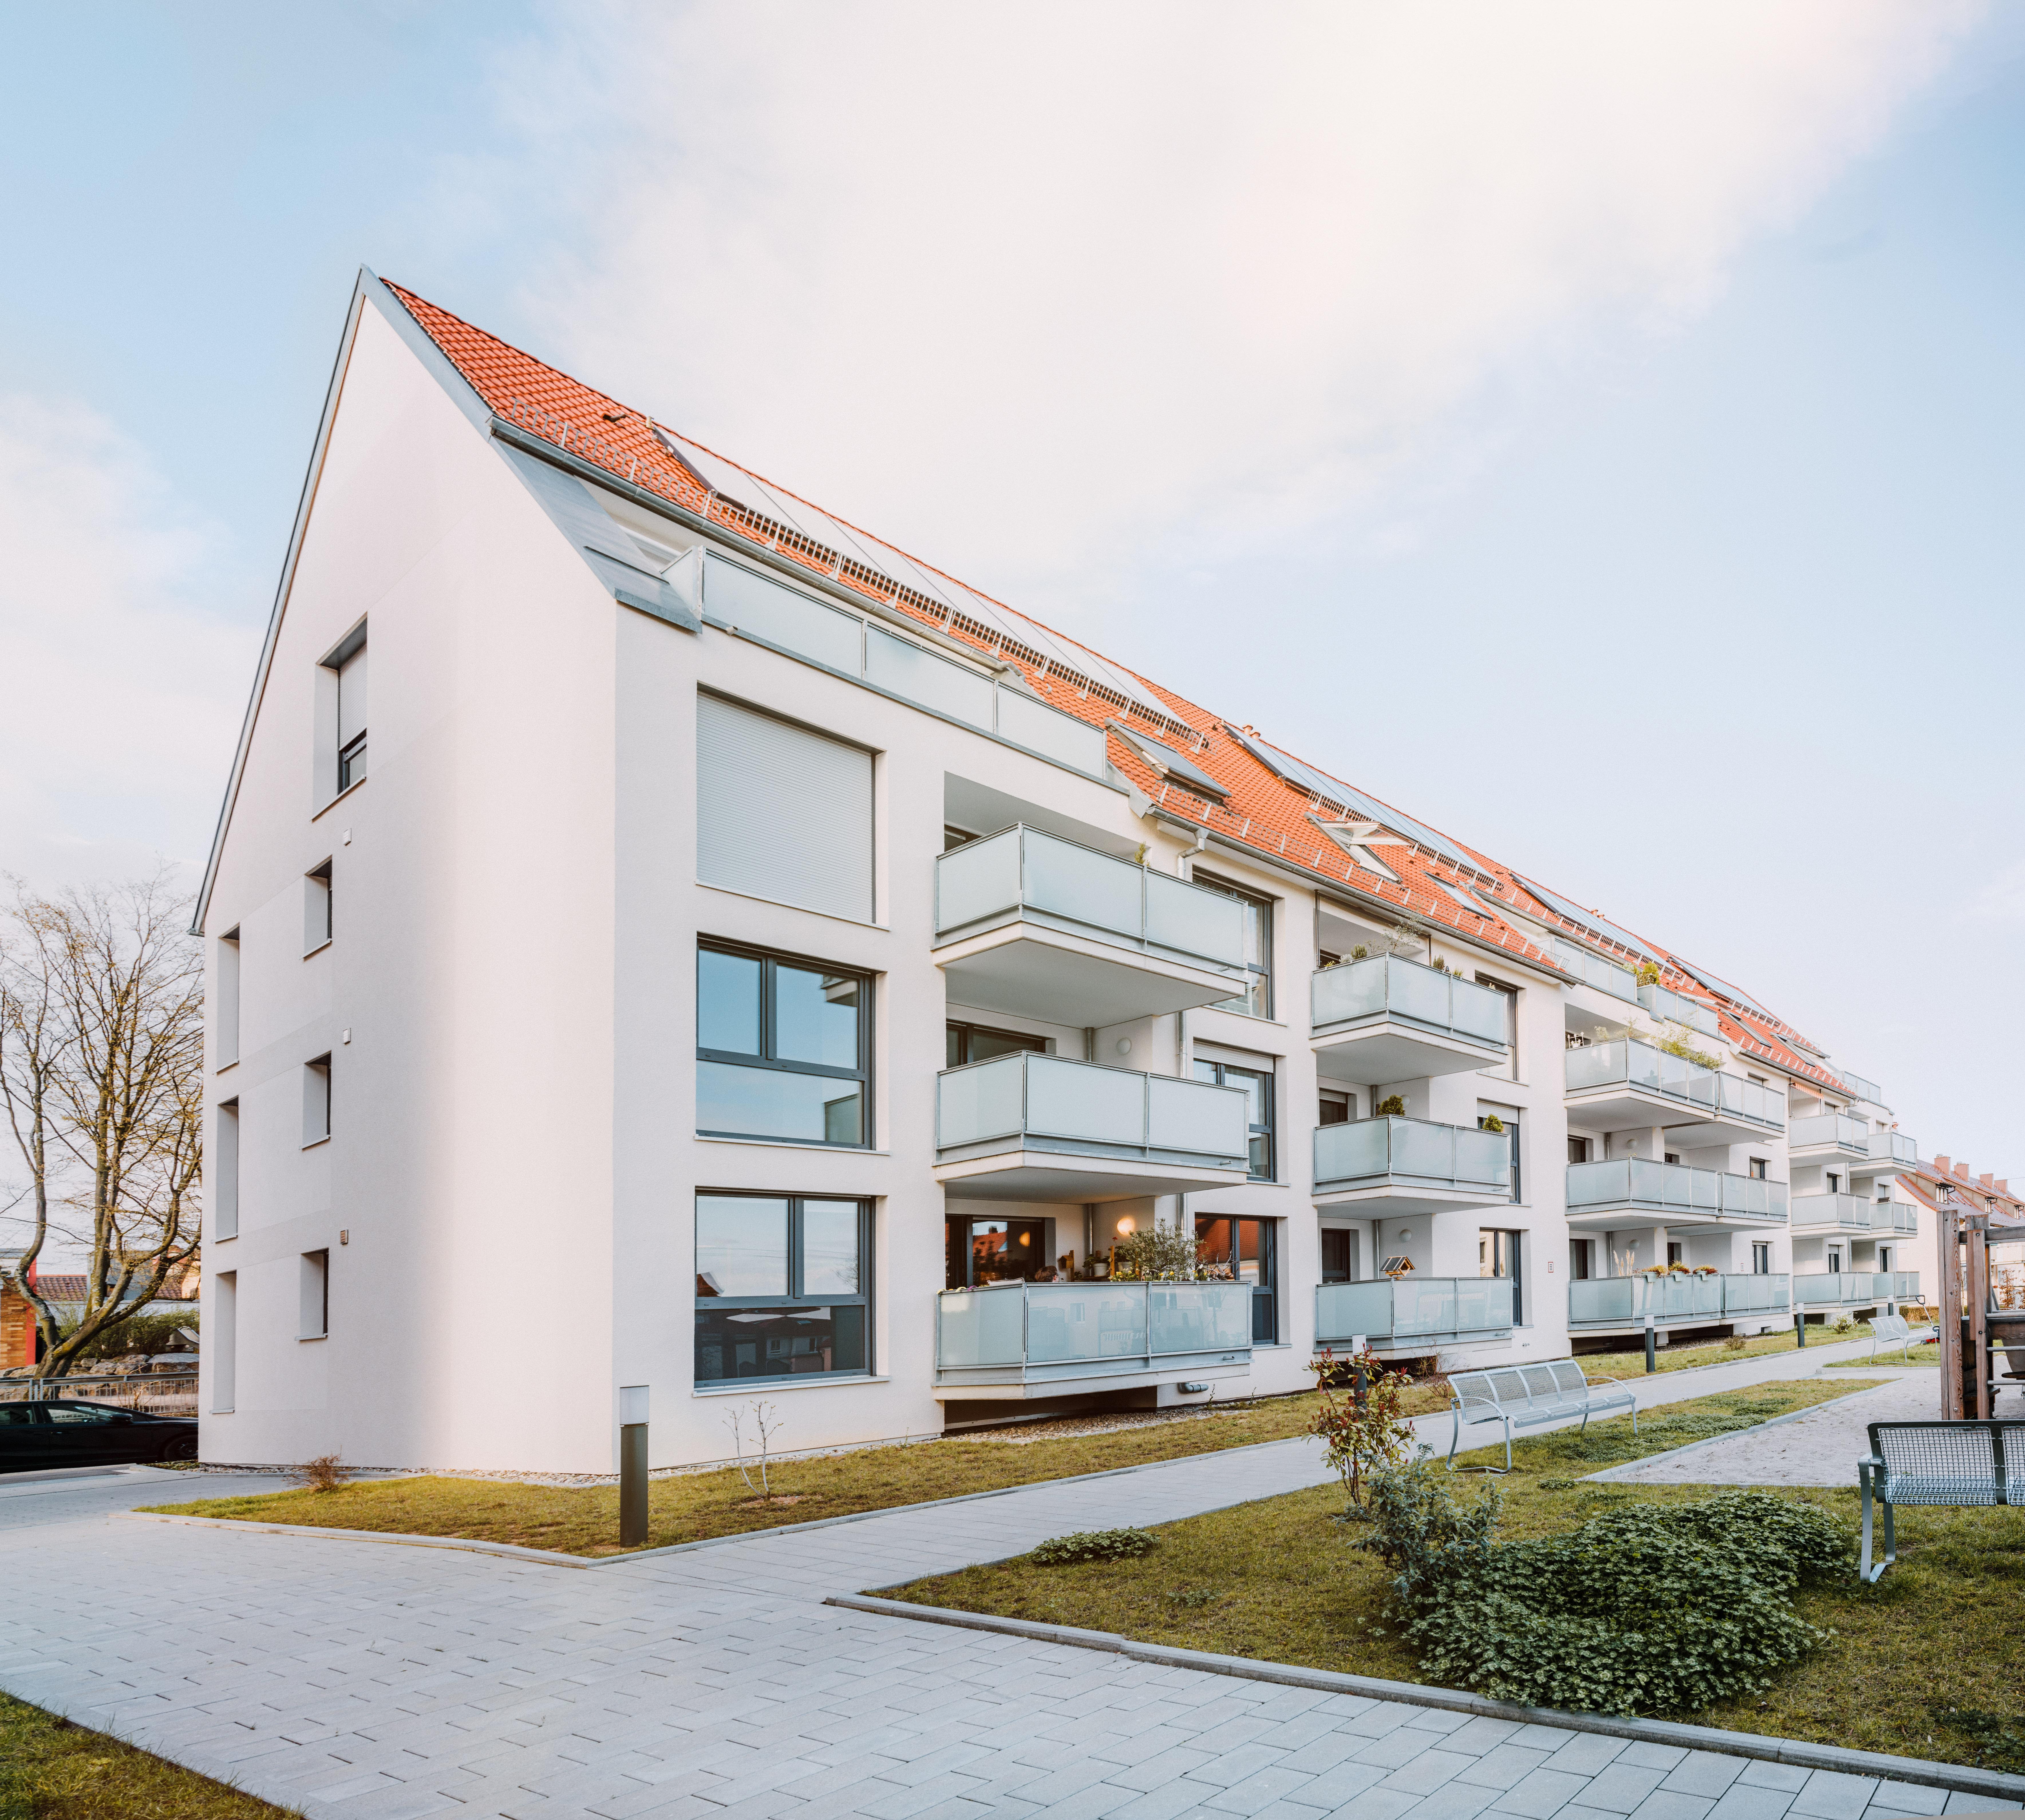 Ulrichstraße (15)